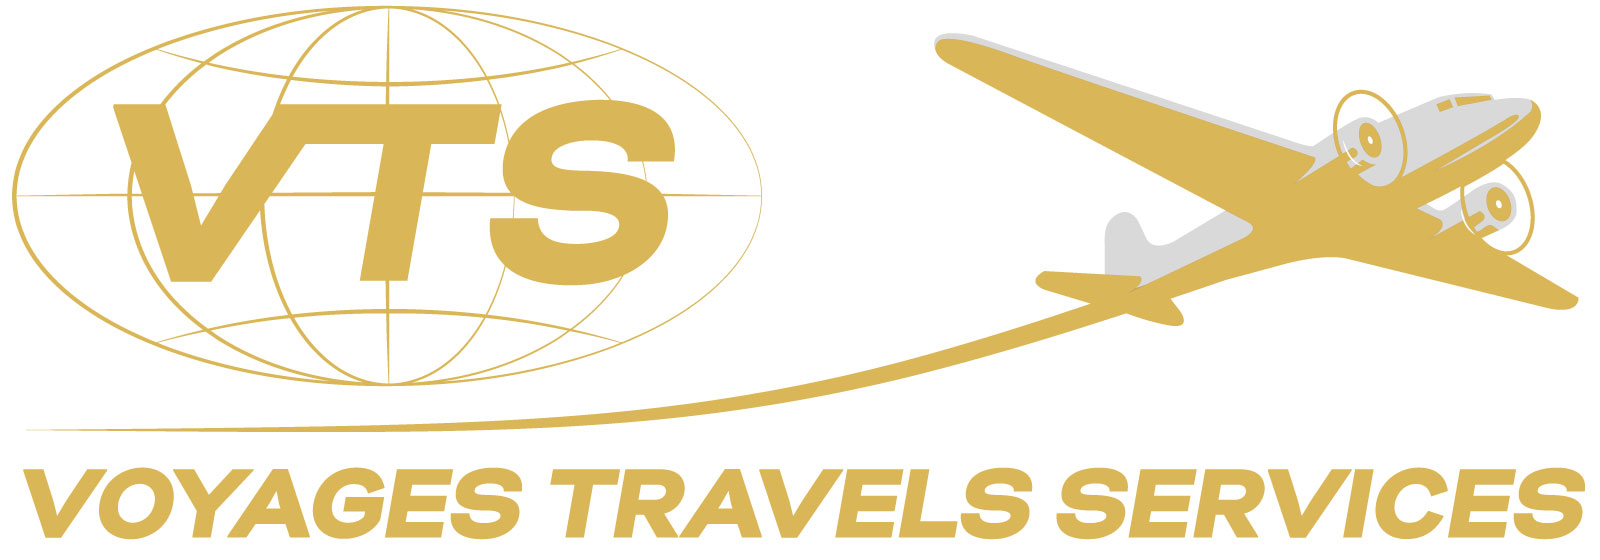 Voyages Travels Services logo